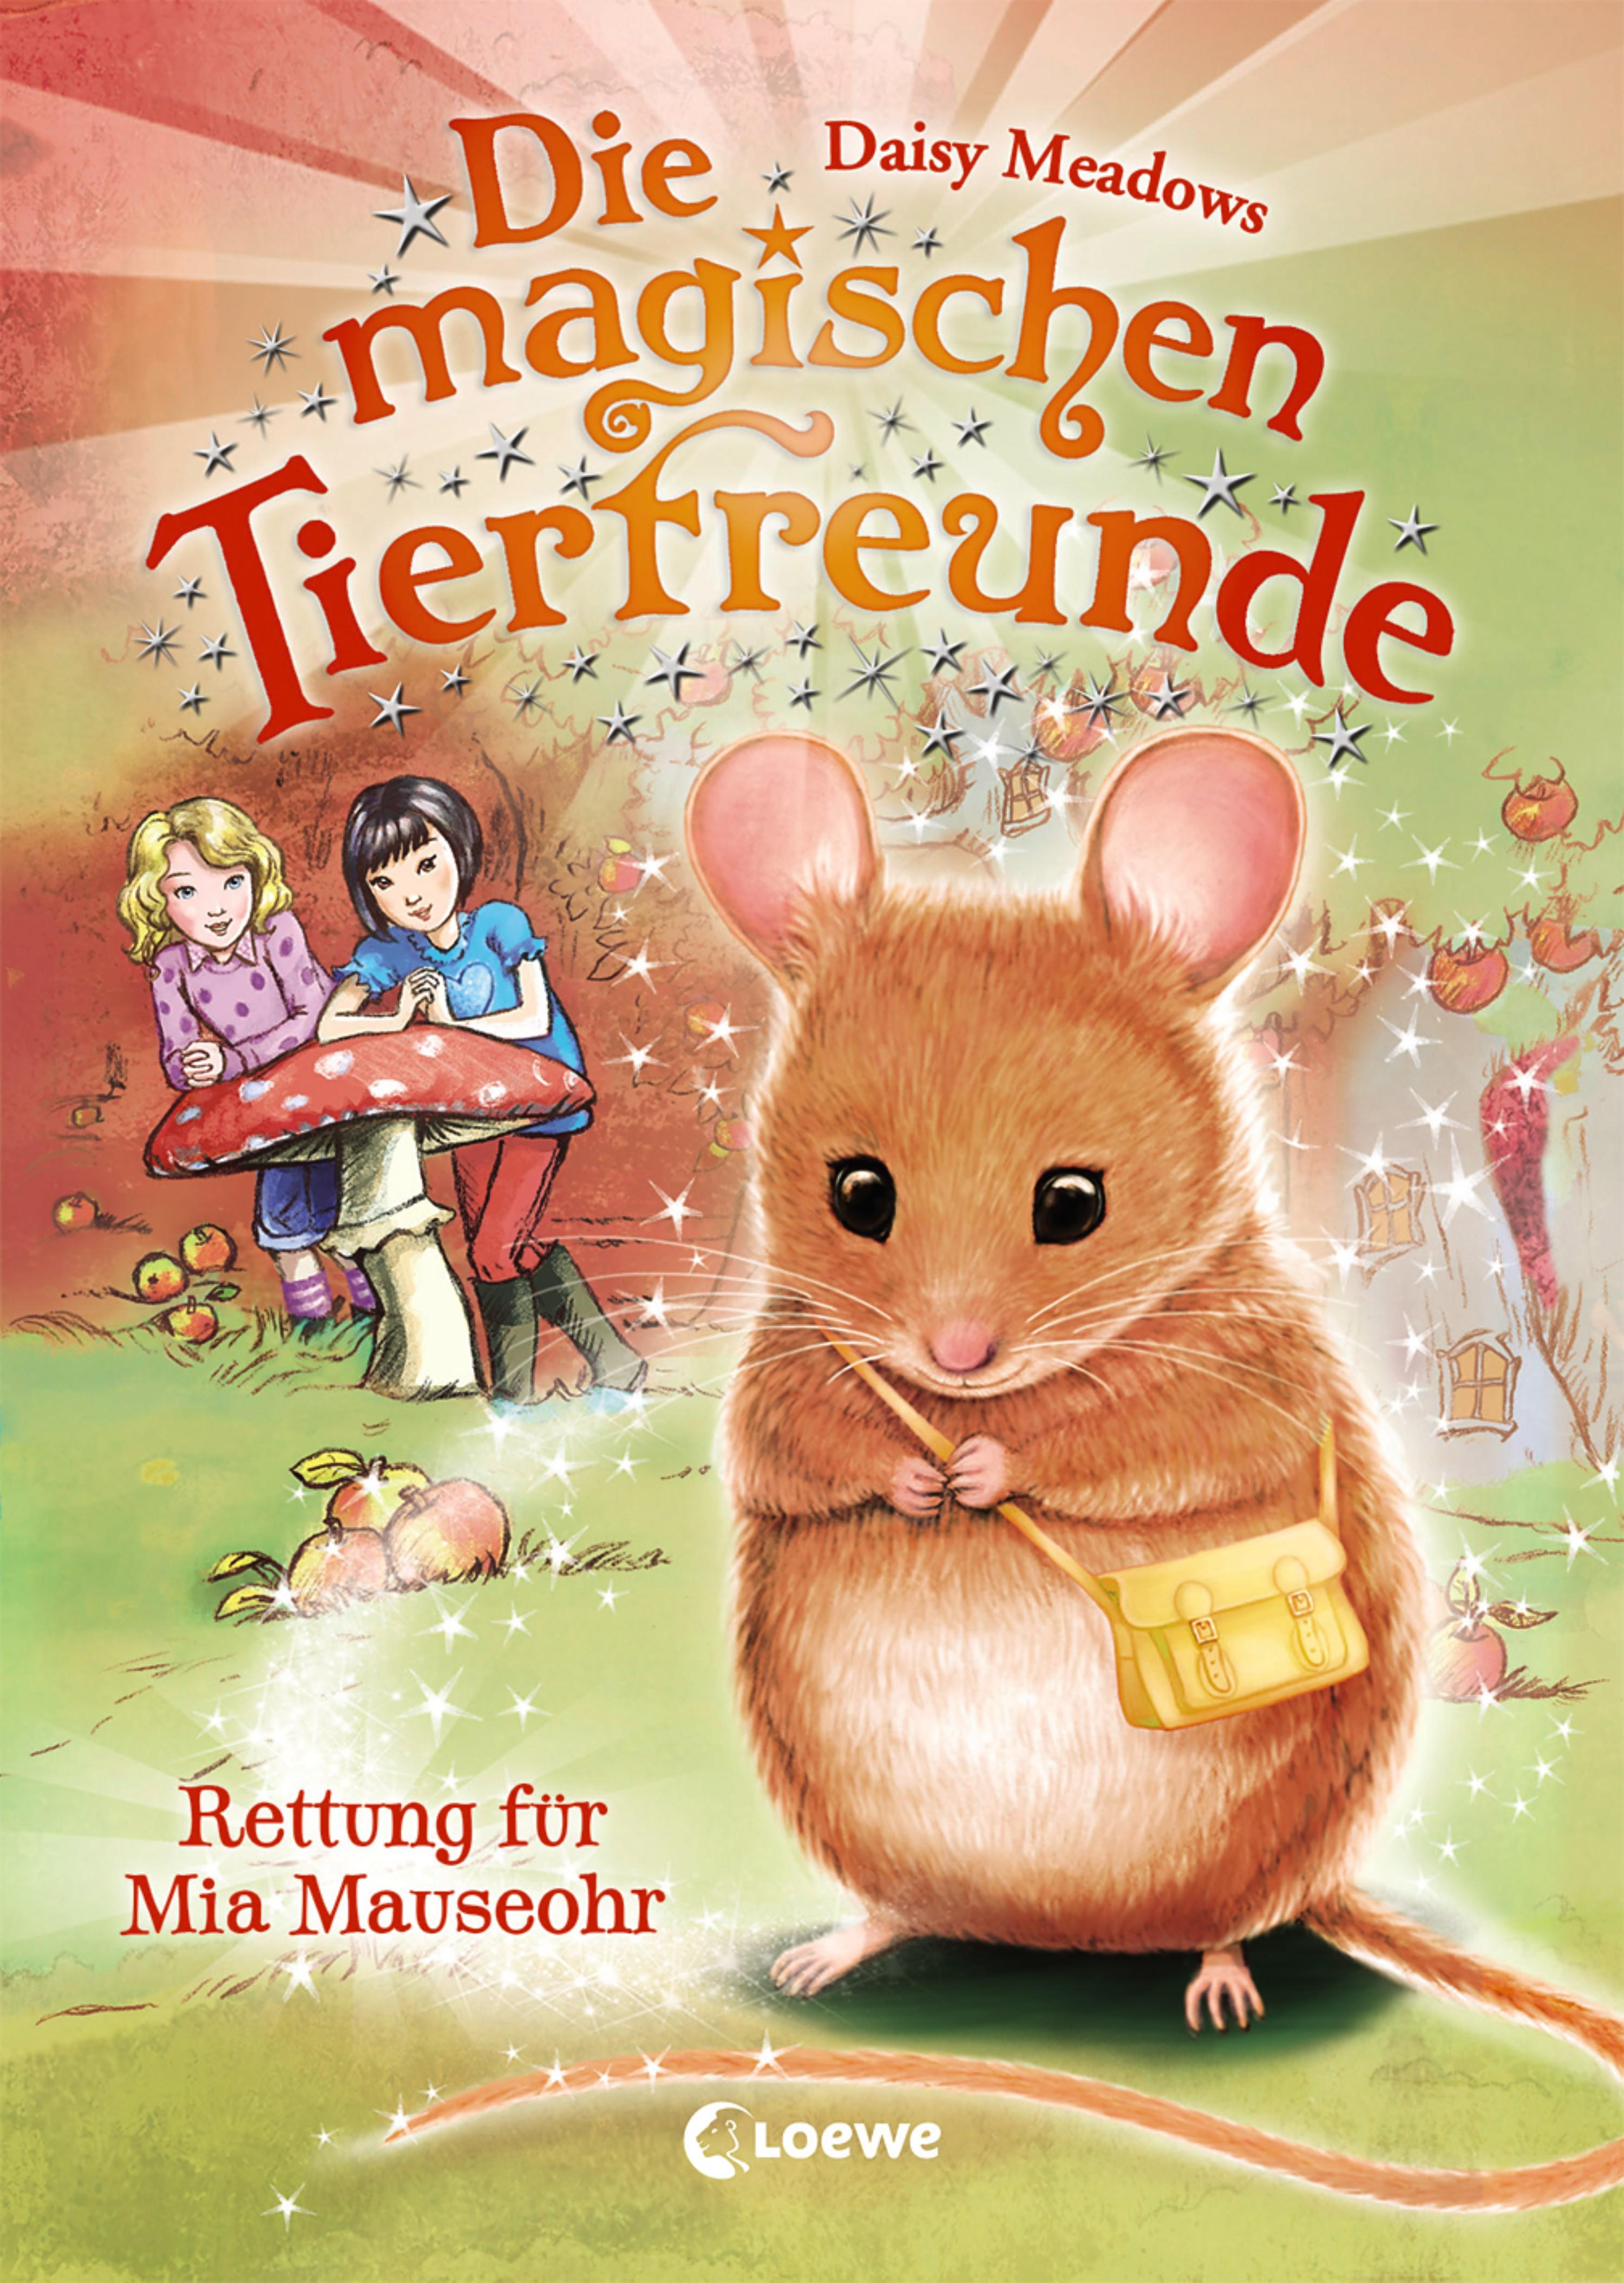 Daisy Meadows Die magischen Tierfreunde 2 - Rettung für Mia Mauseohr daisy meadows magic animal friends early reader lucy longwhiskers